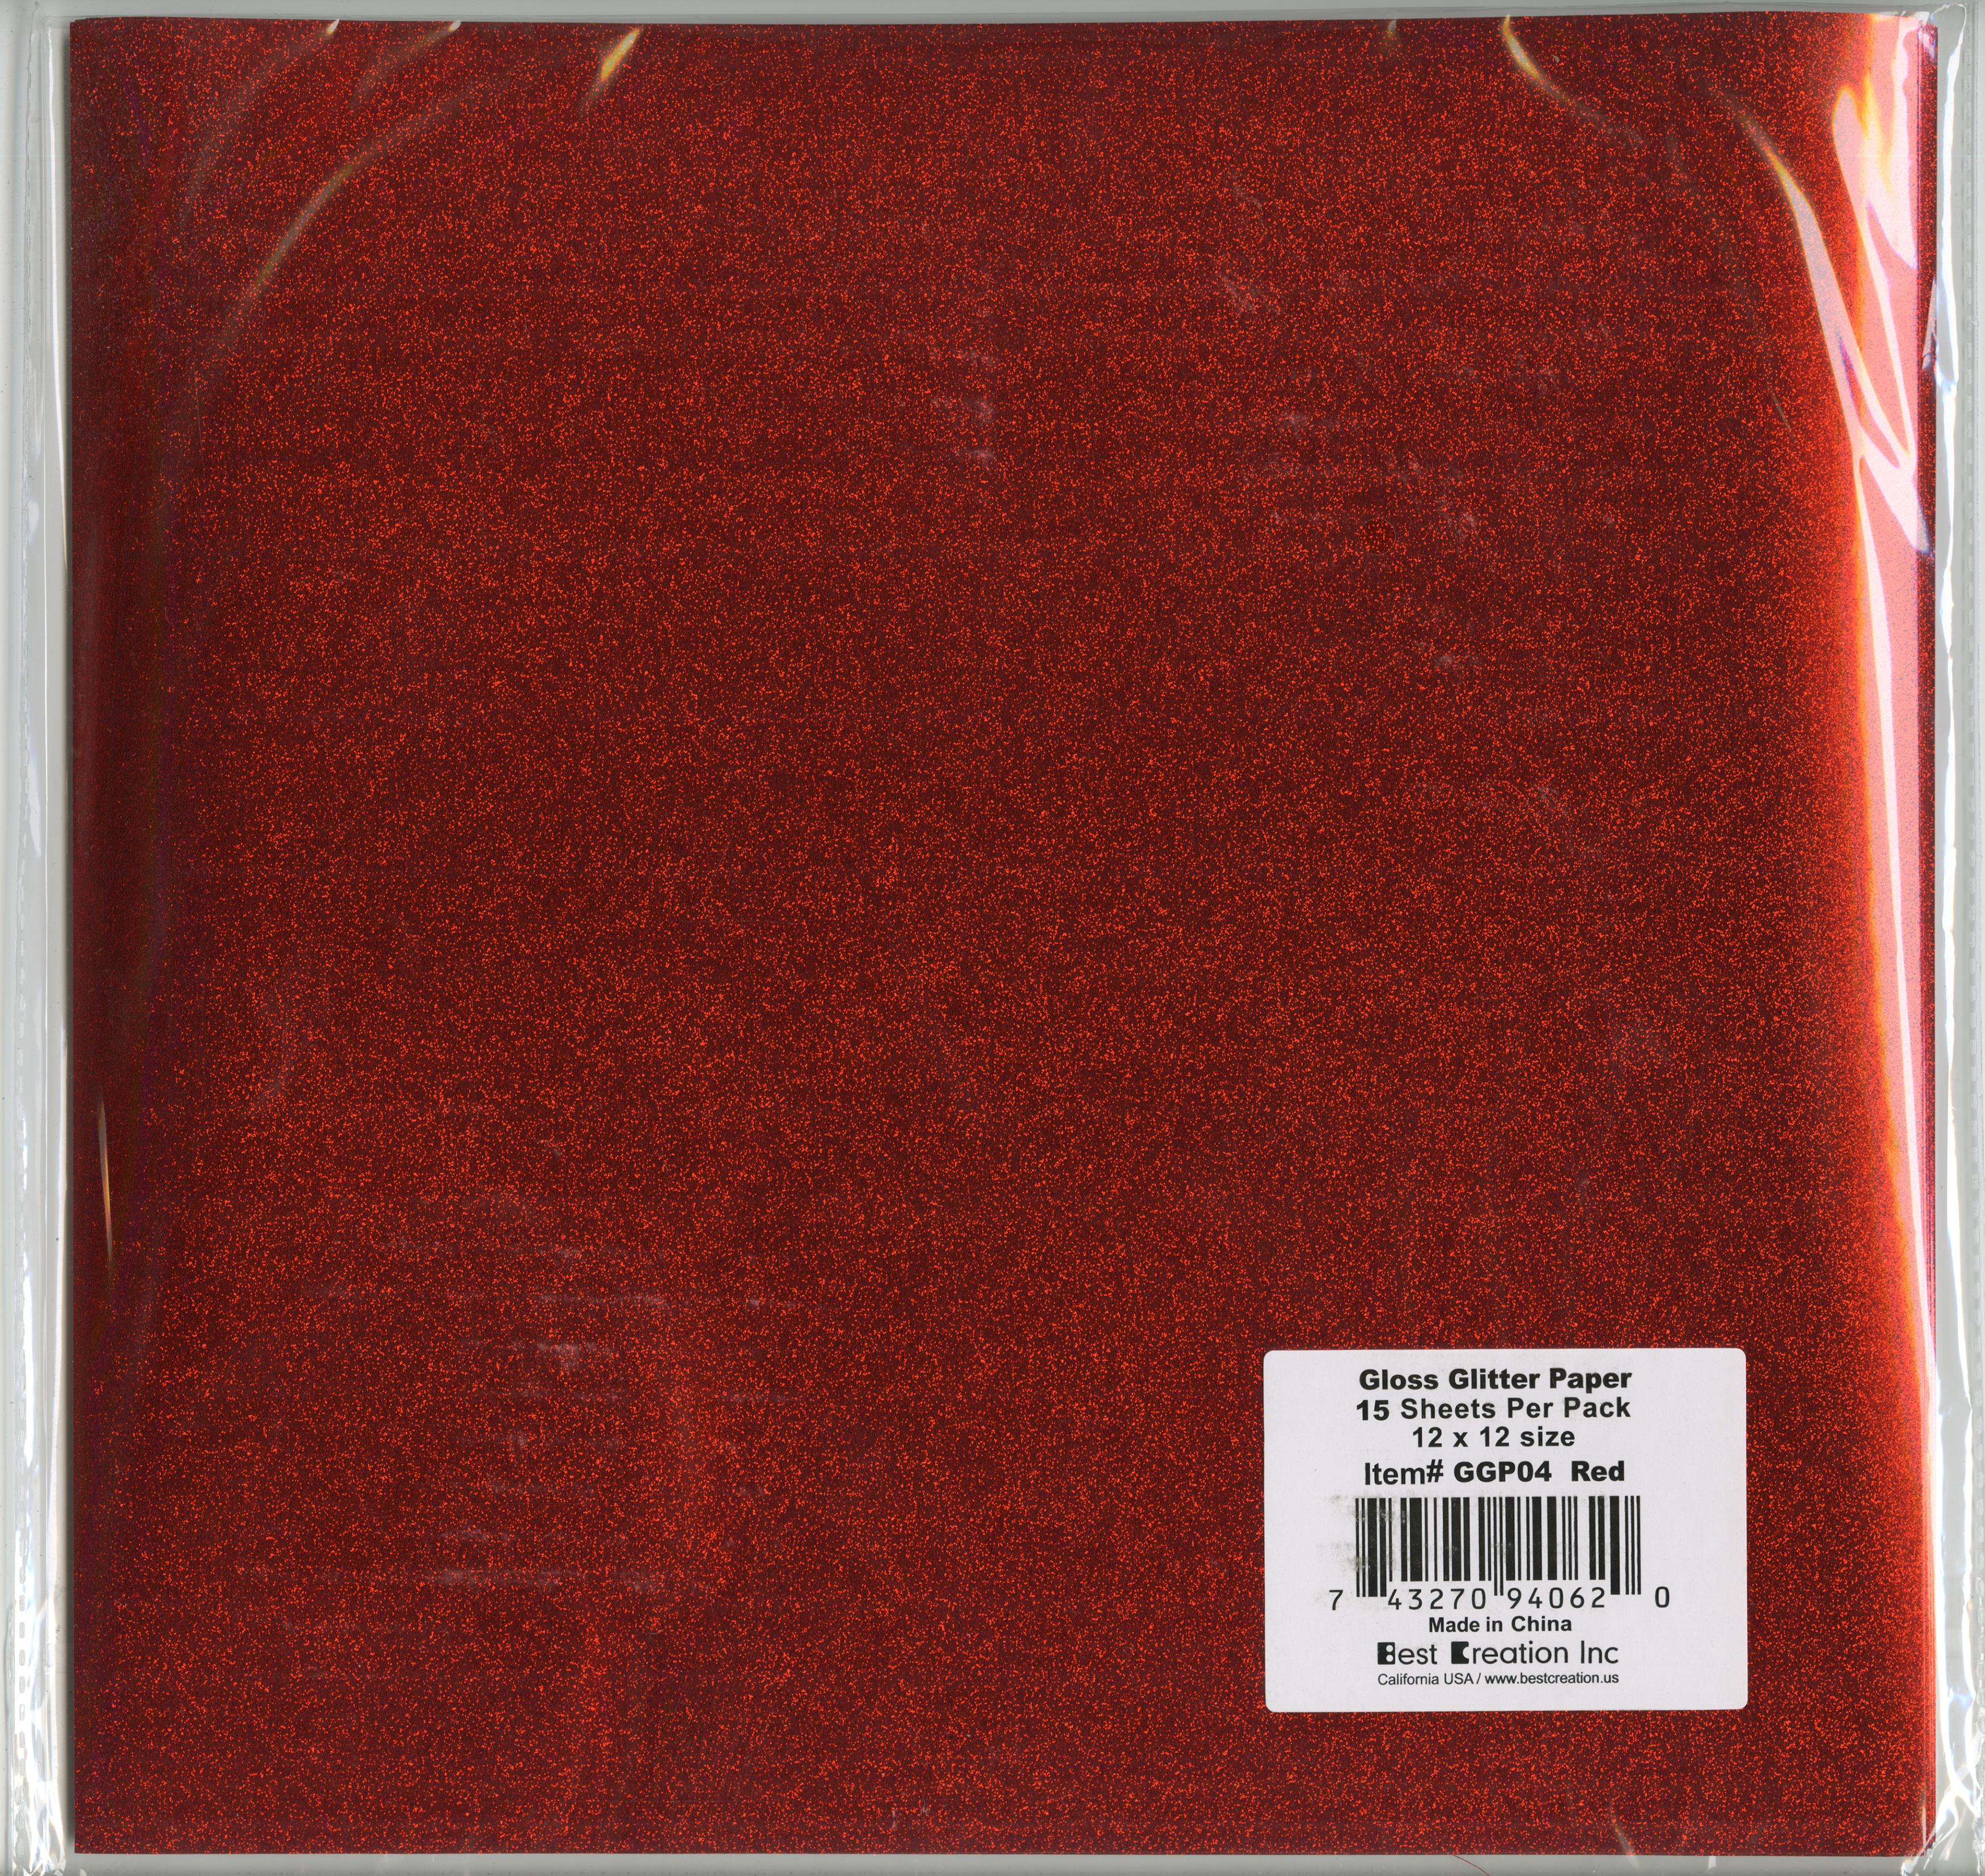 red gloss glitter paper